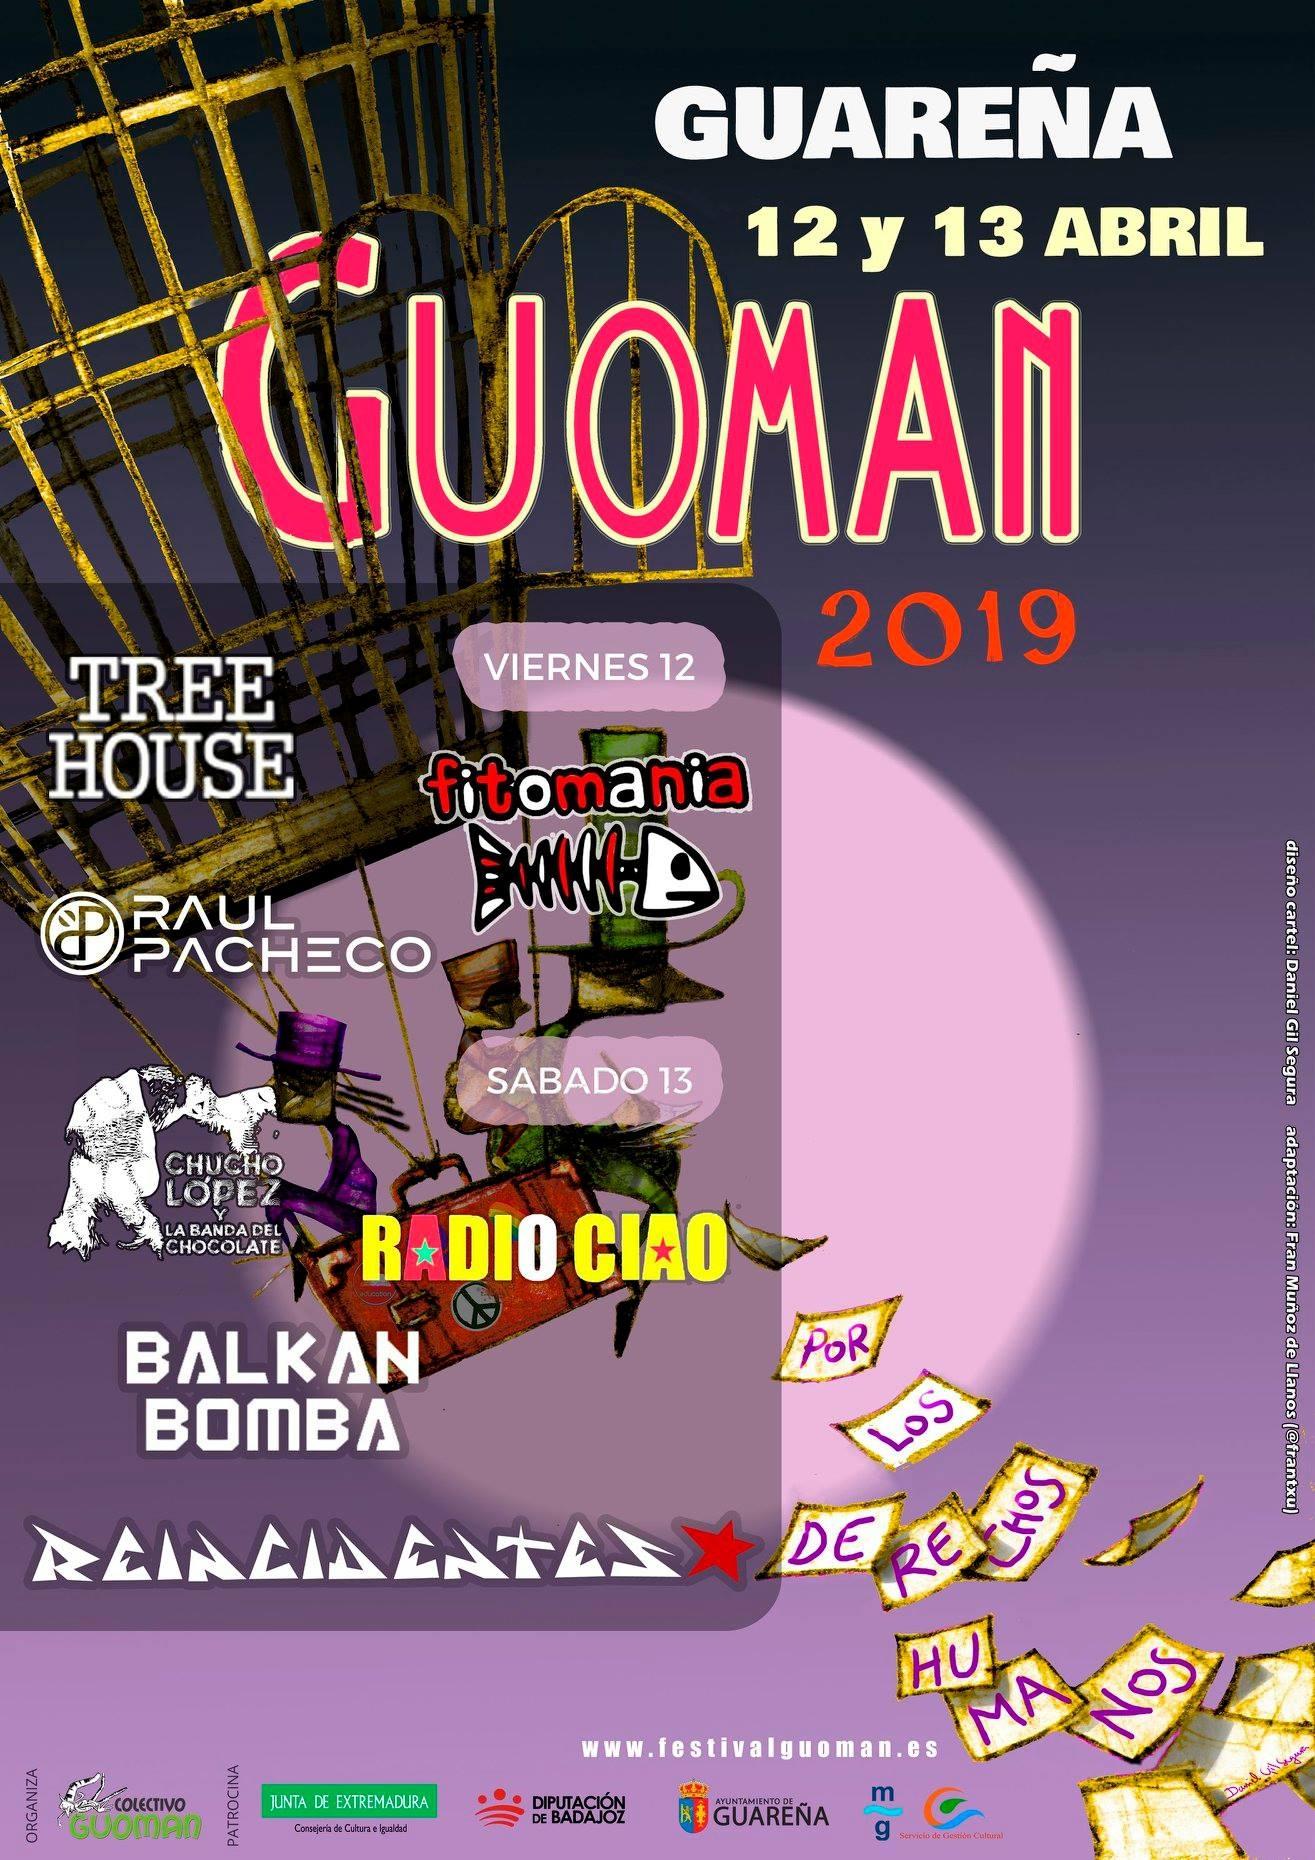 GUOMAN 2019